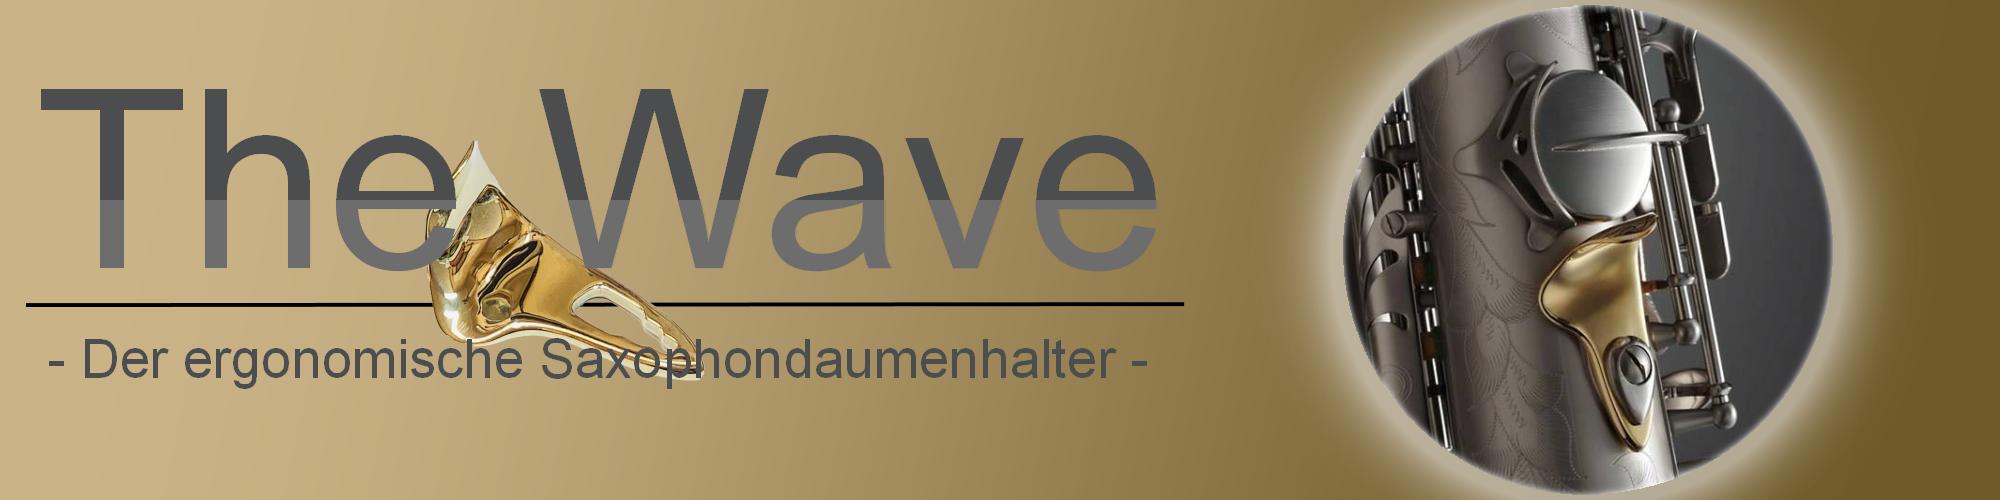 The Wave Daumenhalter Saxophon